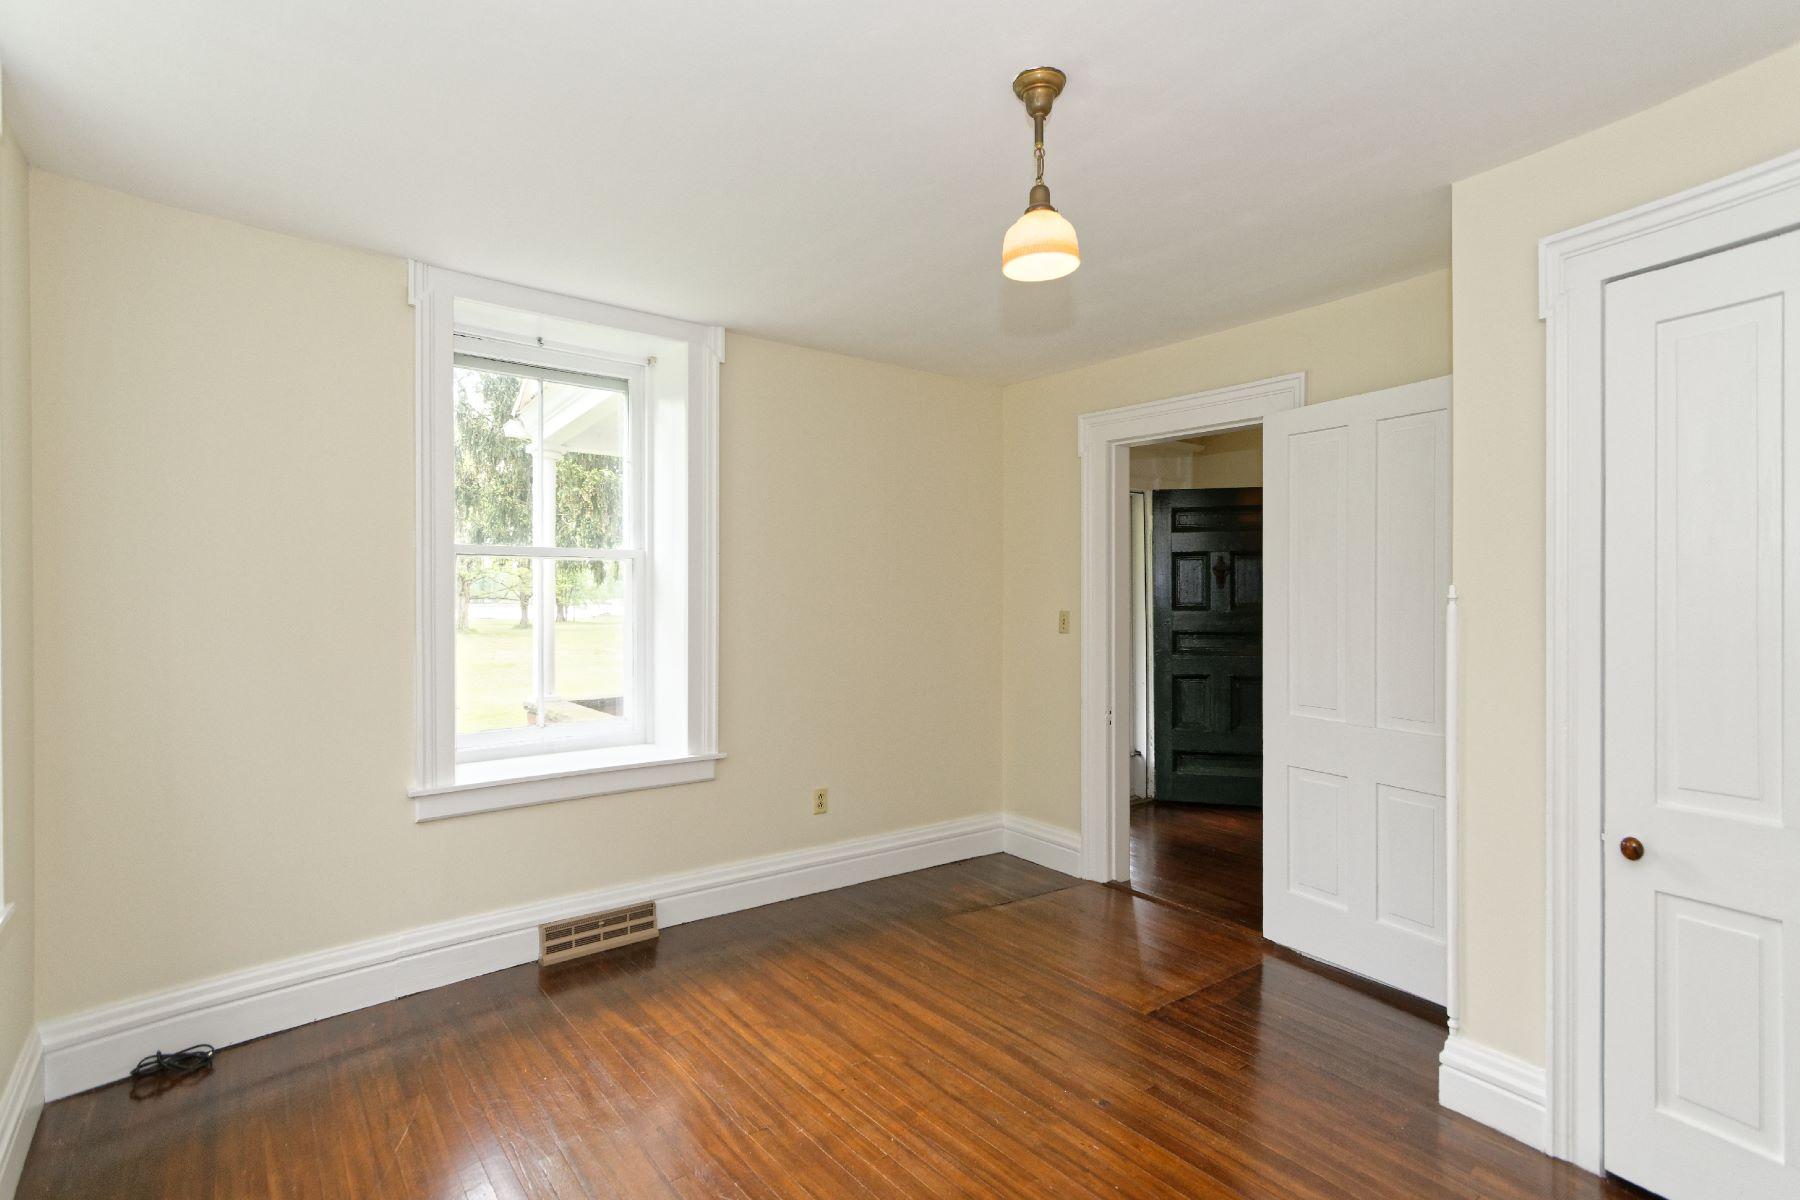 Additional photo for property listing at Upper Landing Riverfront 129 Riverside Av Coxsackie, New York 12051 United States